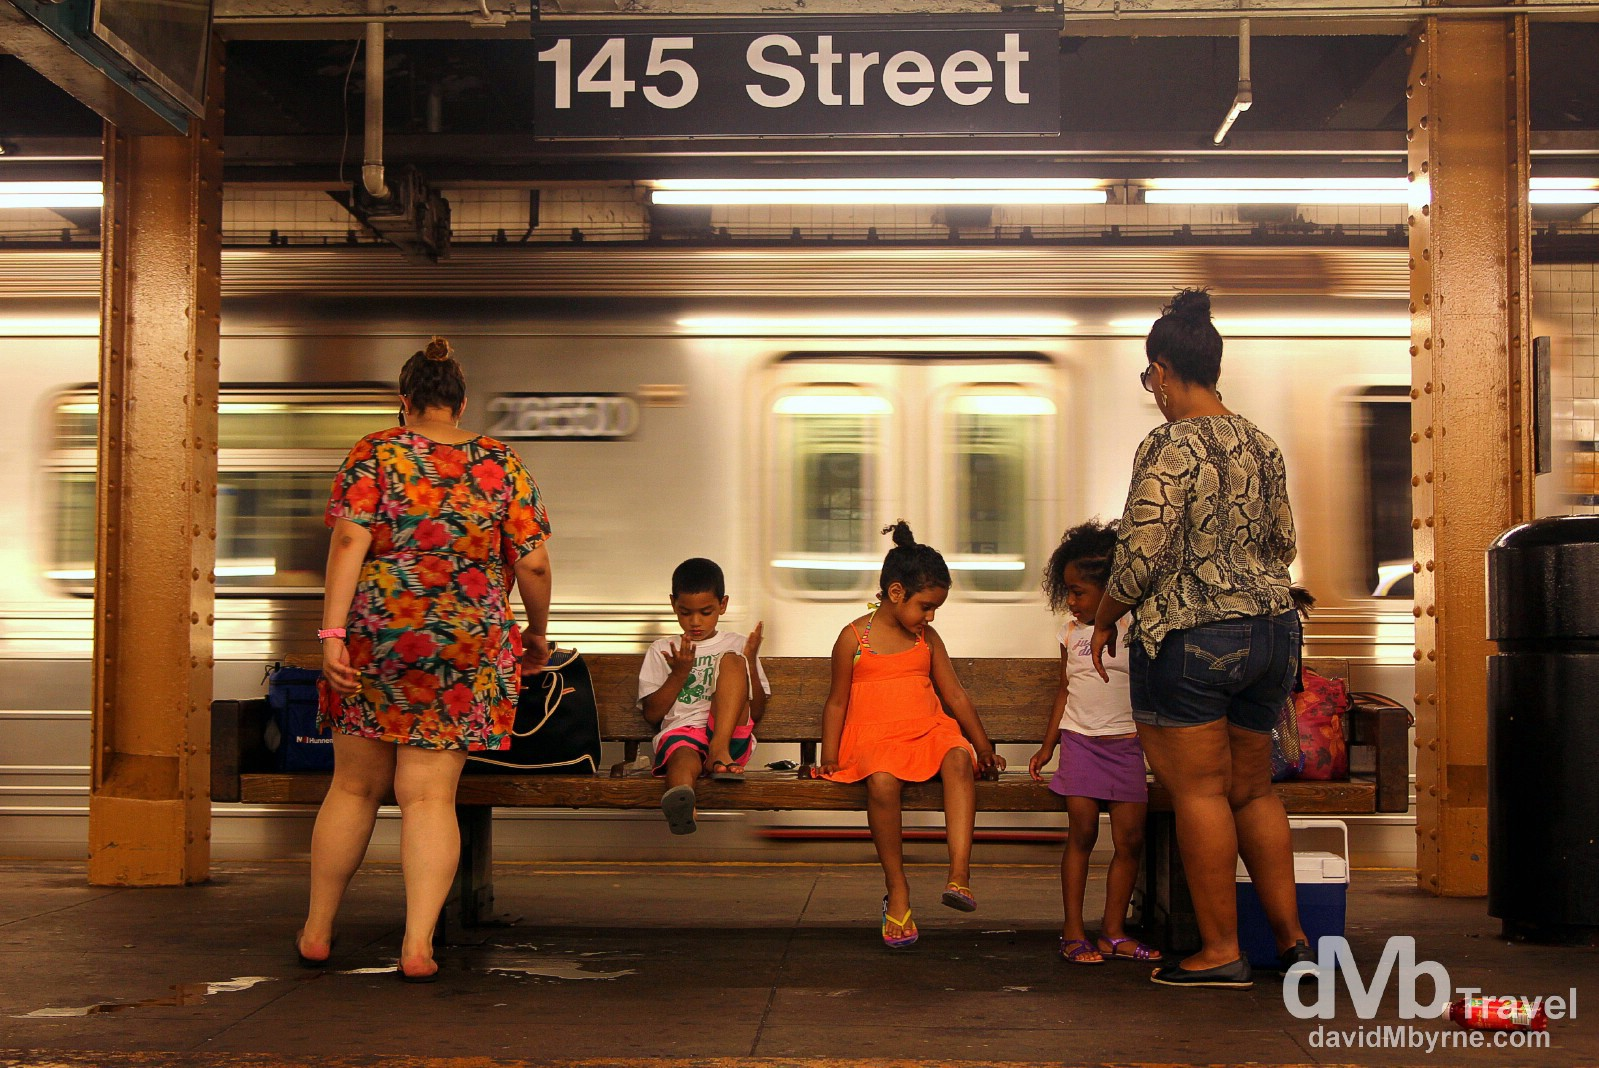 On the platform of 145 Street subway station, Manhattan, New York. July 14th 2013.